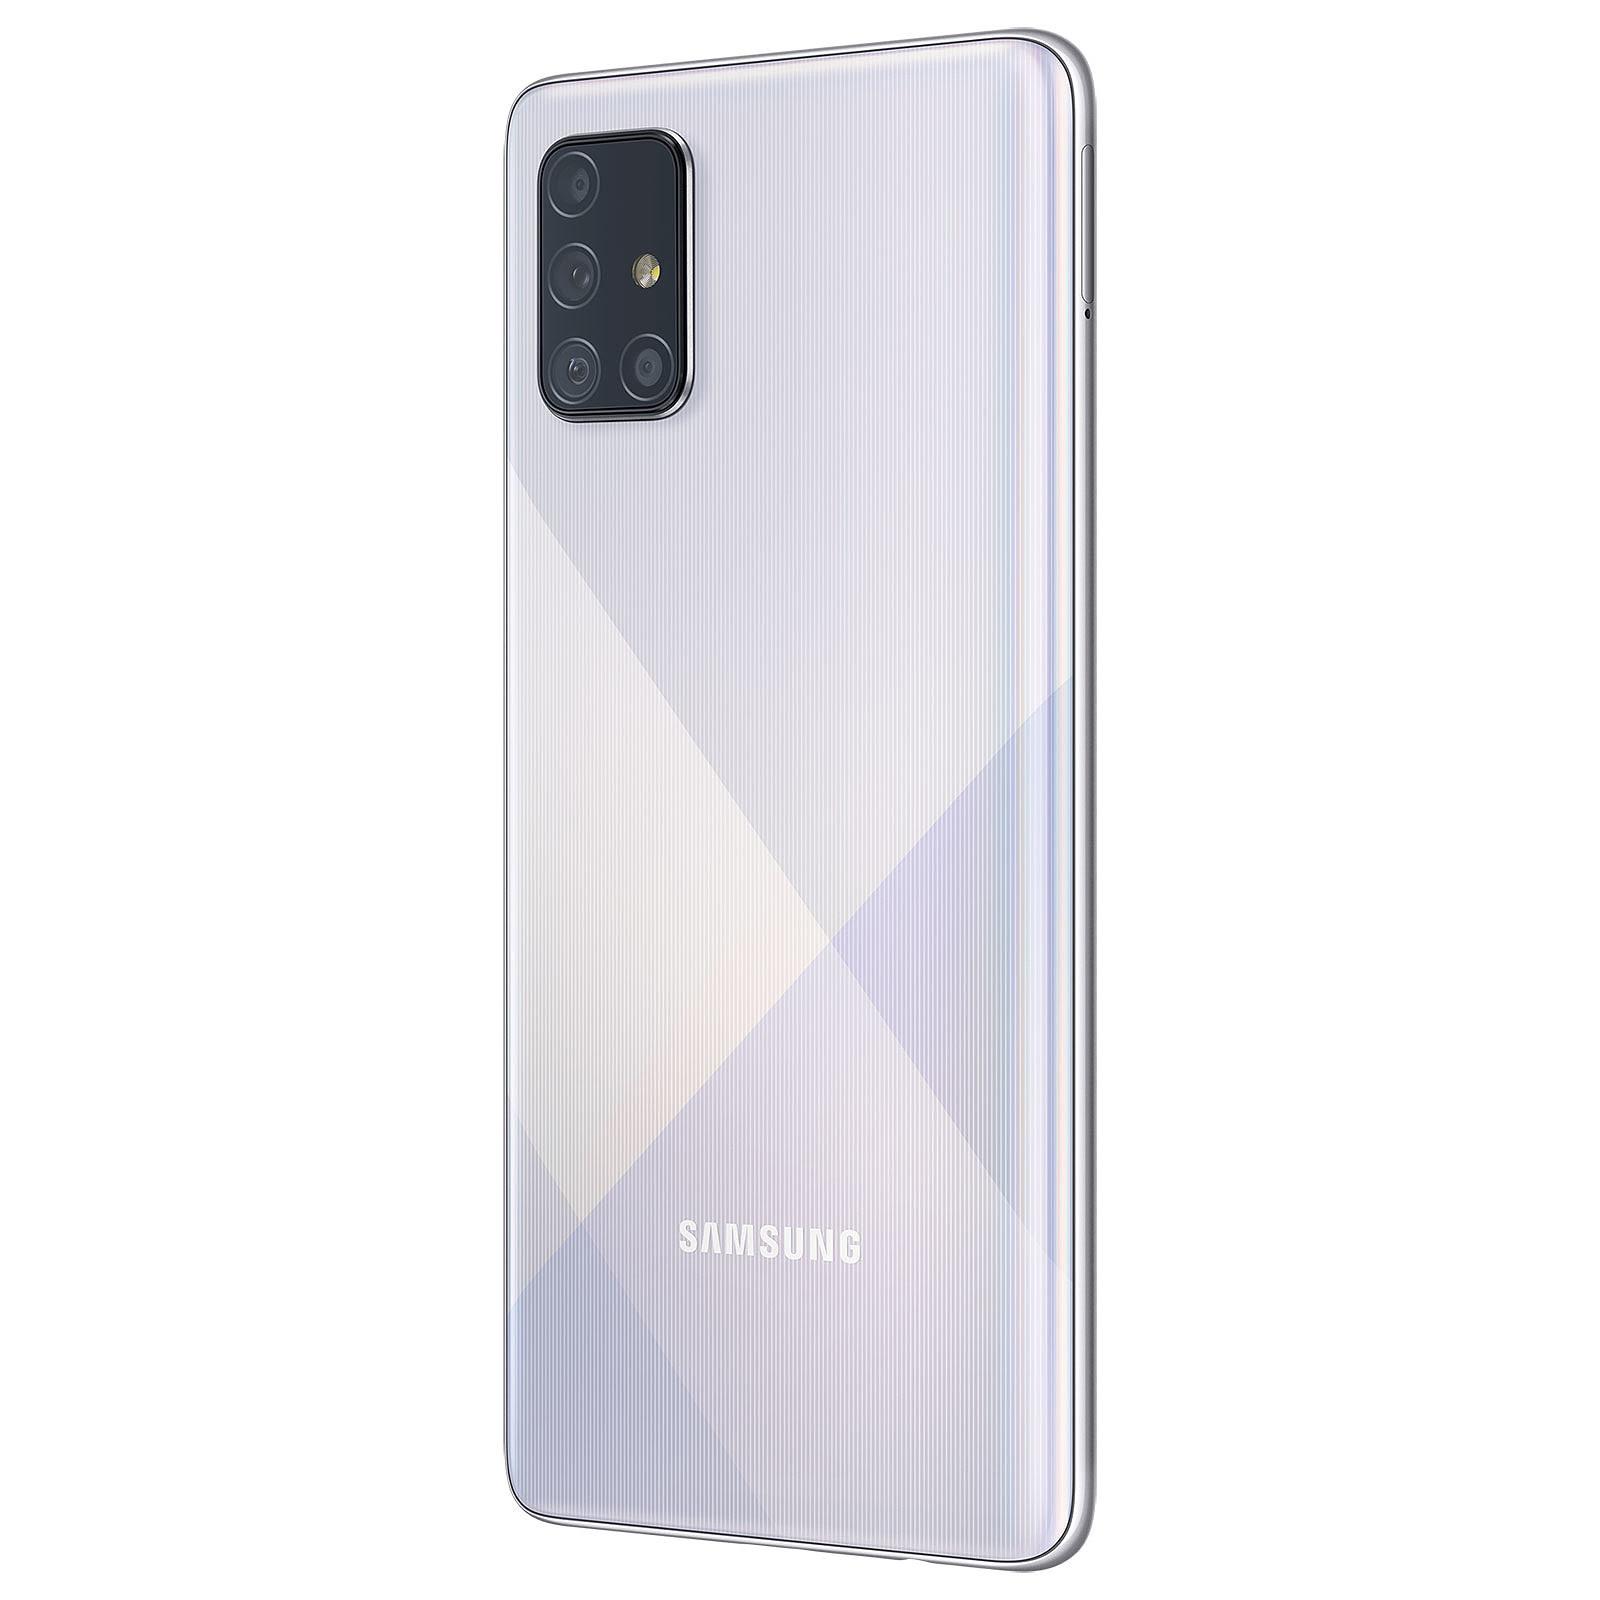 Samsung Galaxy A71 128Go Silver - Téléphonie Samsung - Cybertek.fr - 2